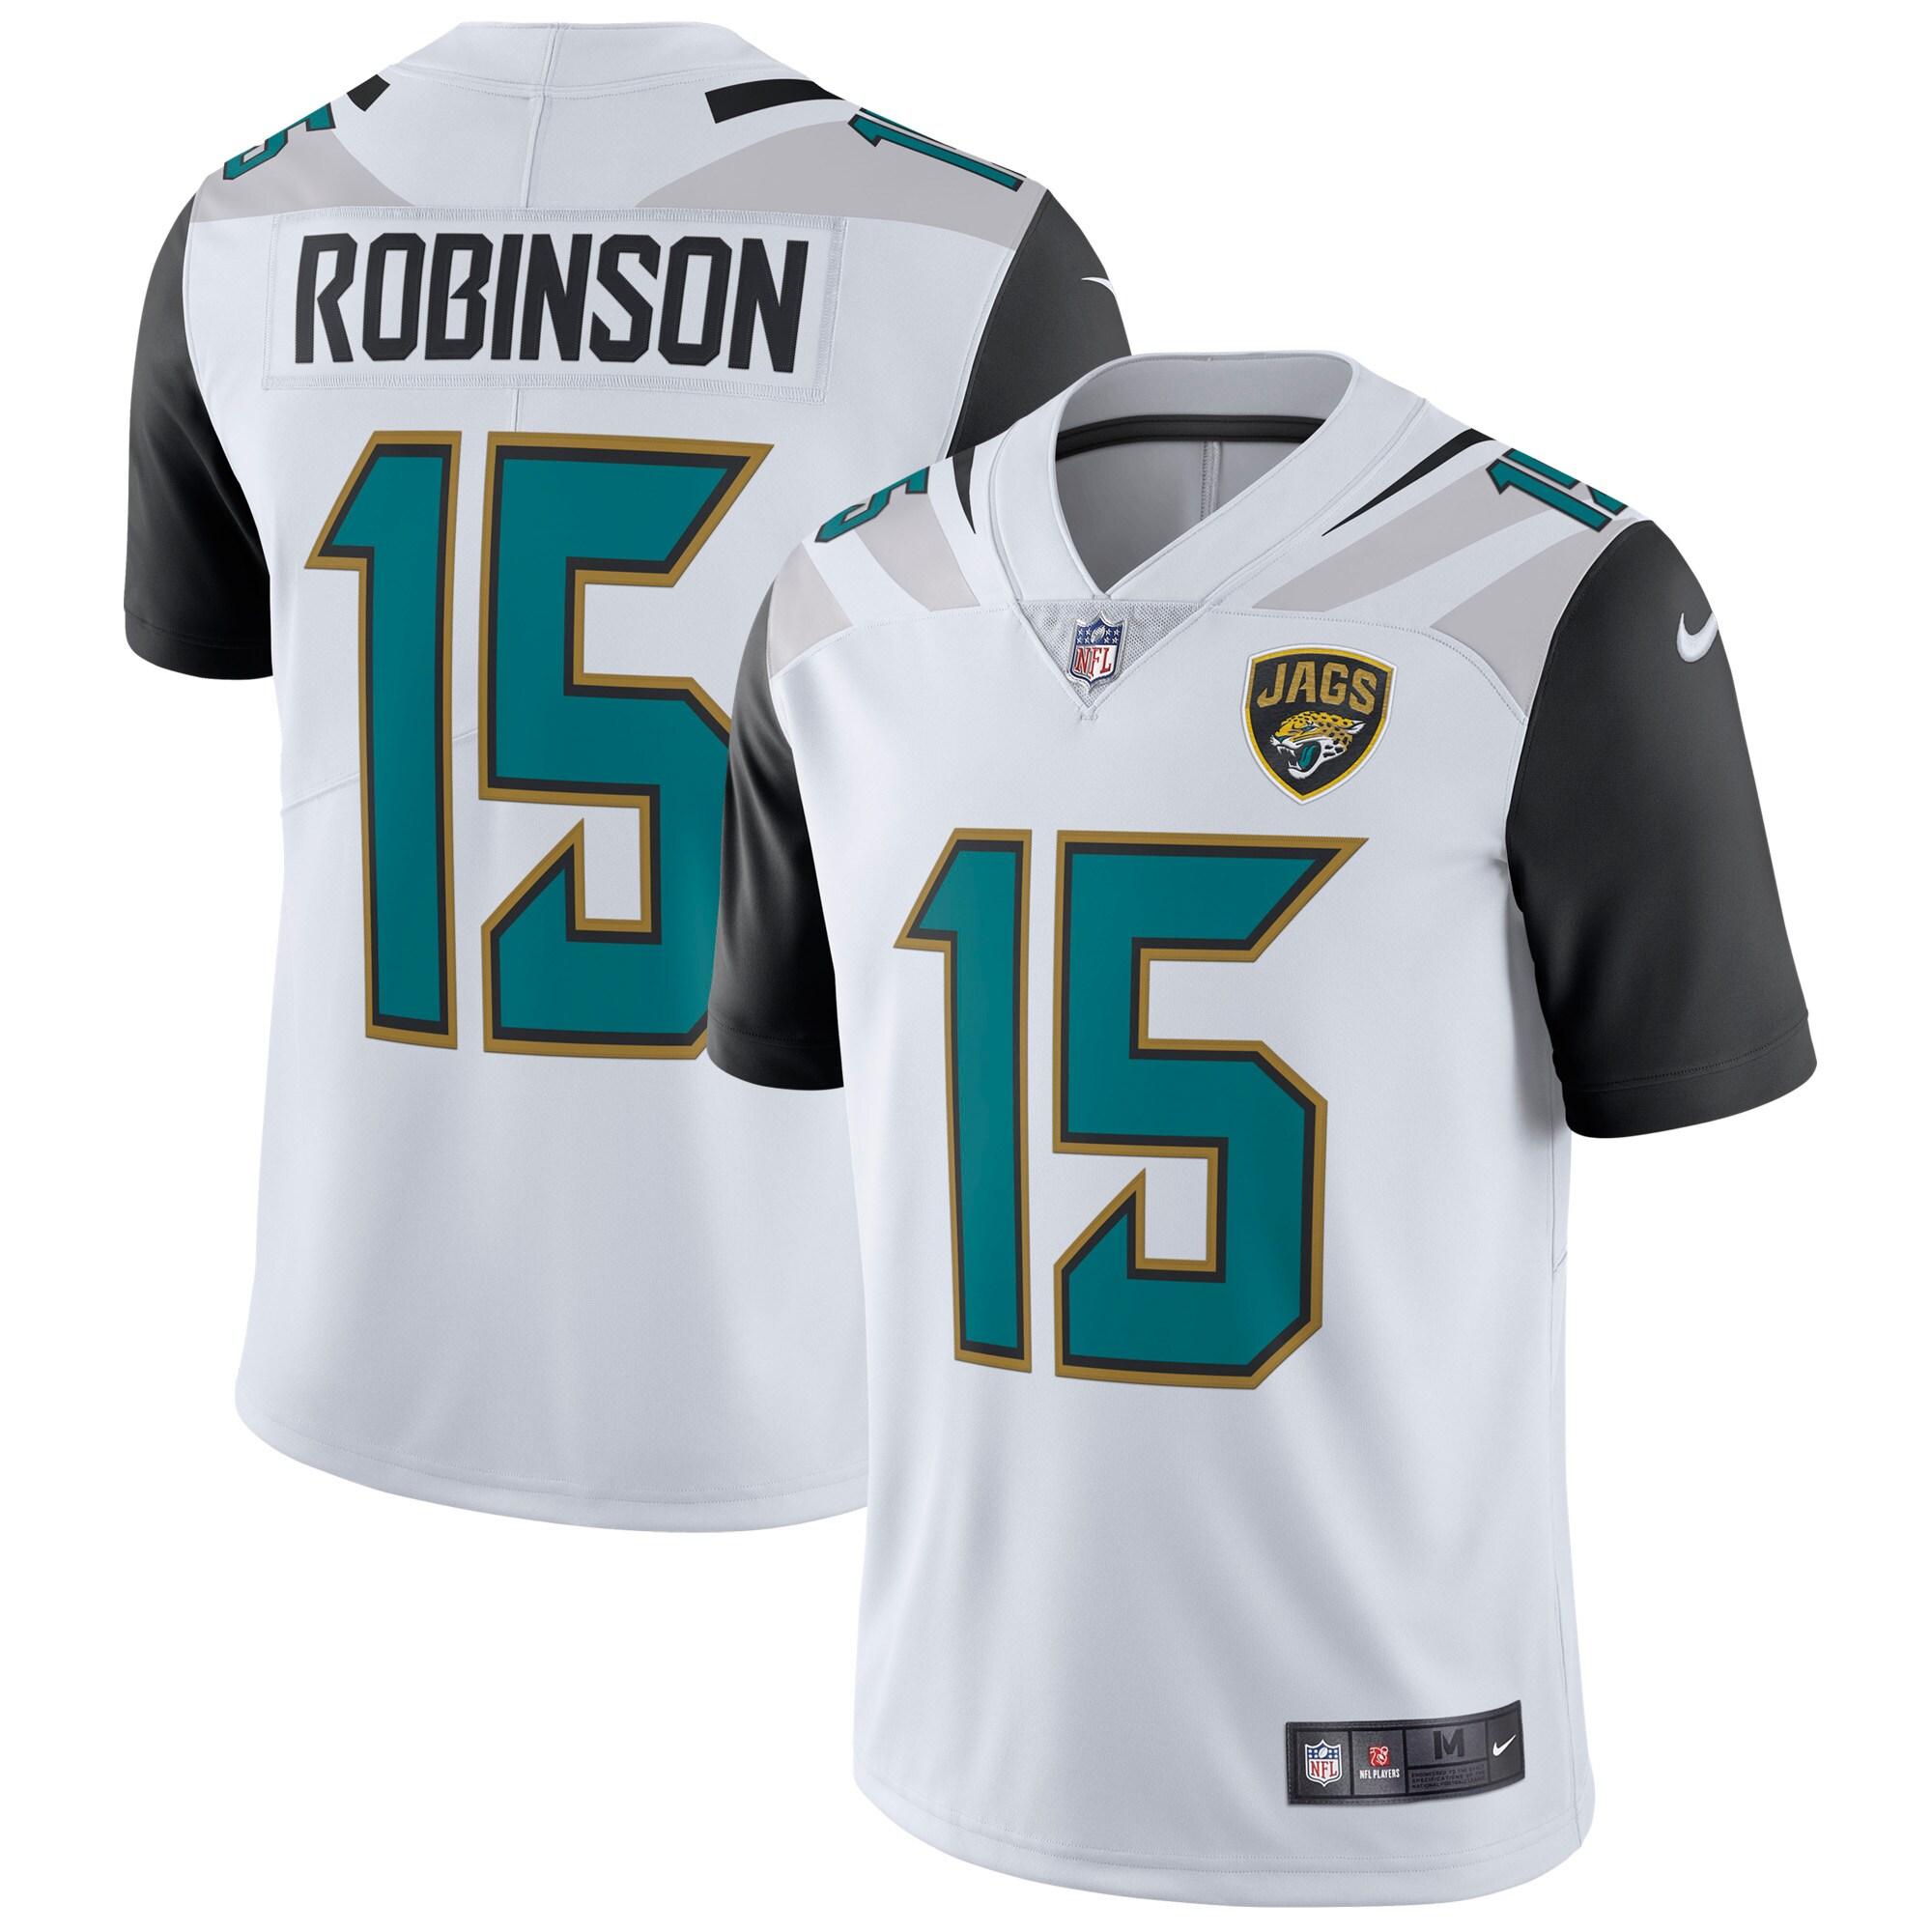 Allen Robinson Jacksonville Jaguars Nike Vapor Untouchable Limited Player Jersey - White